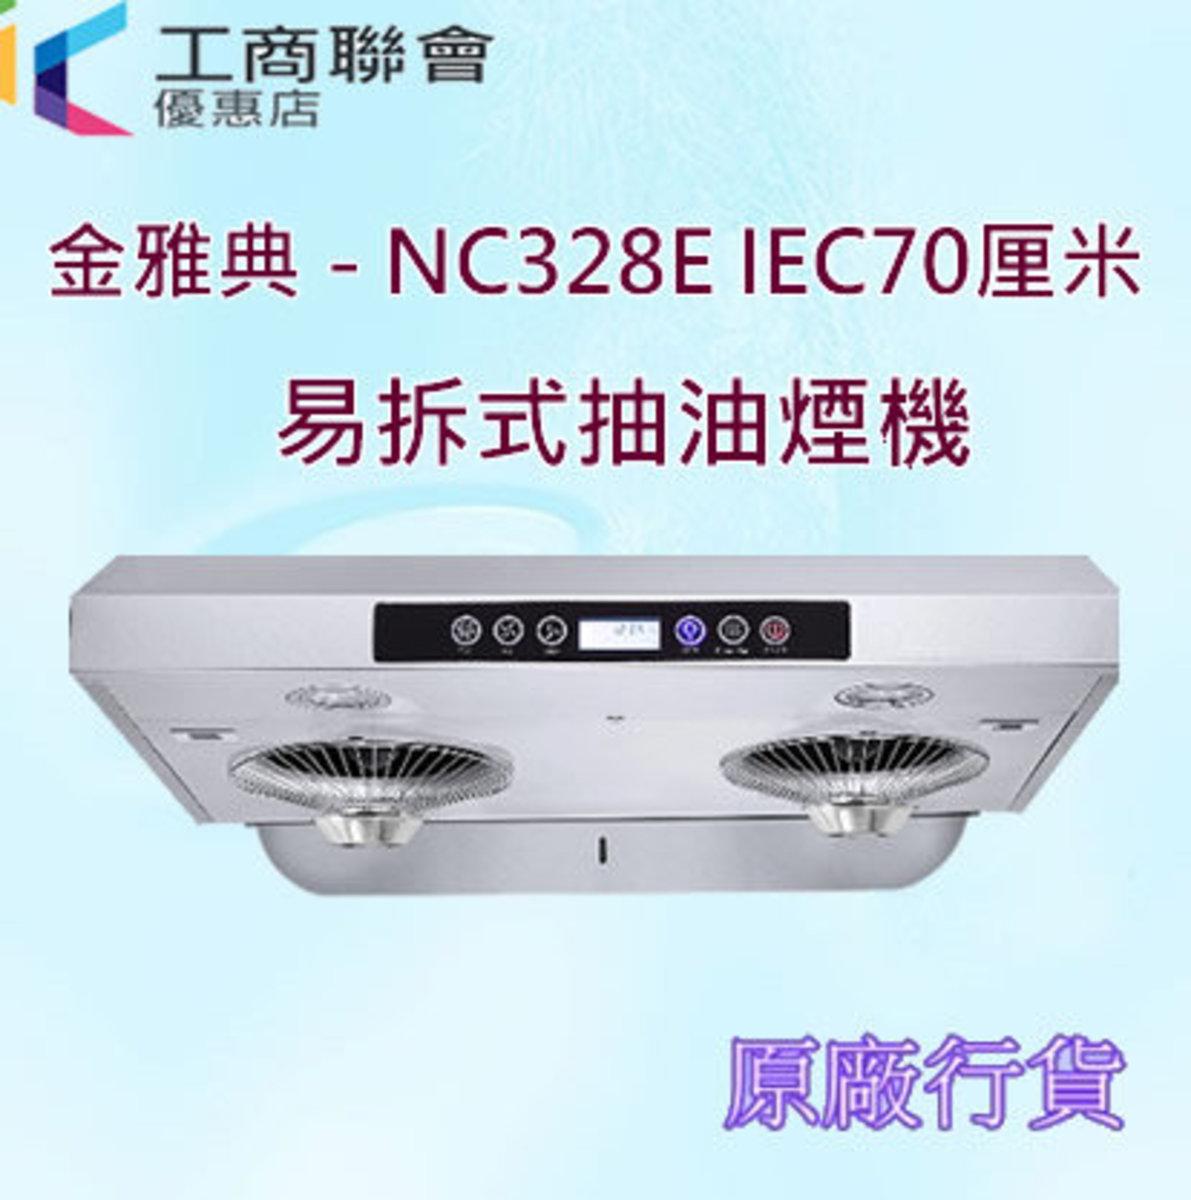 NC328E IEC 70厘米 易拆式抽油煙機